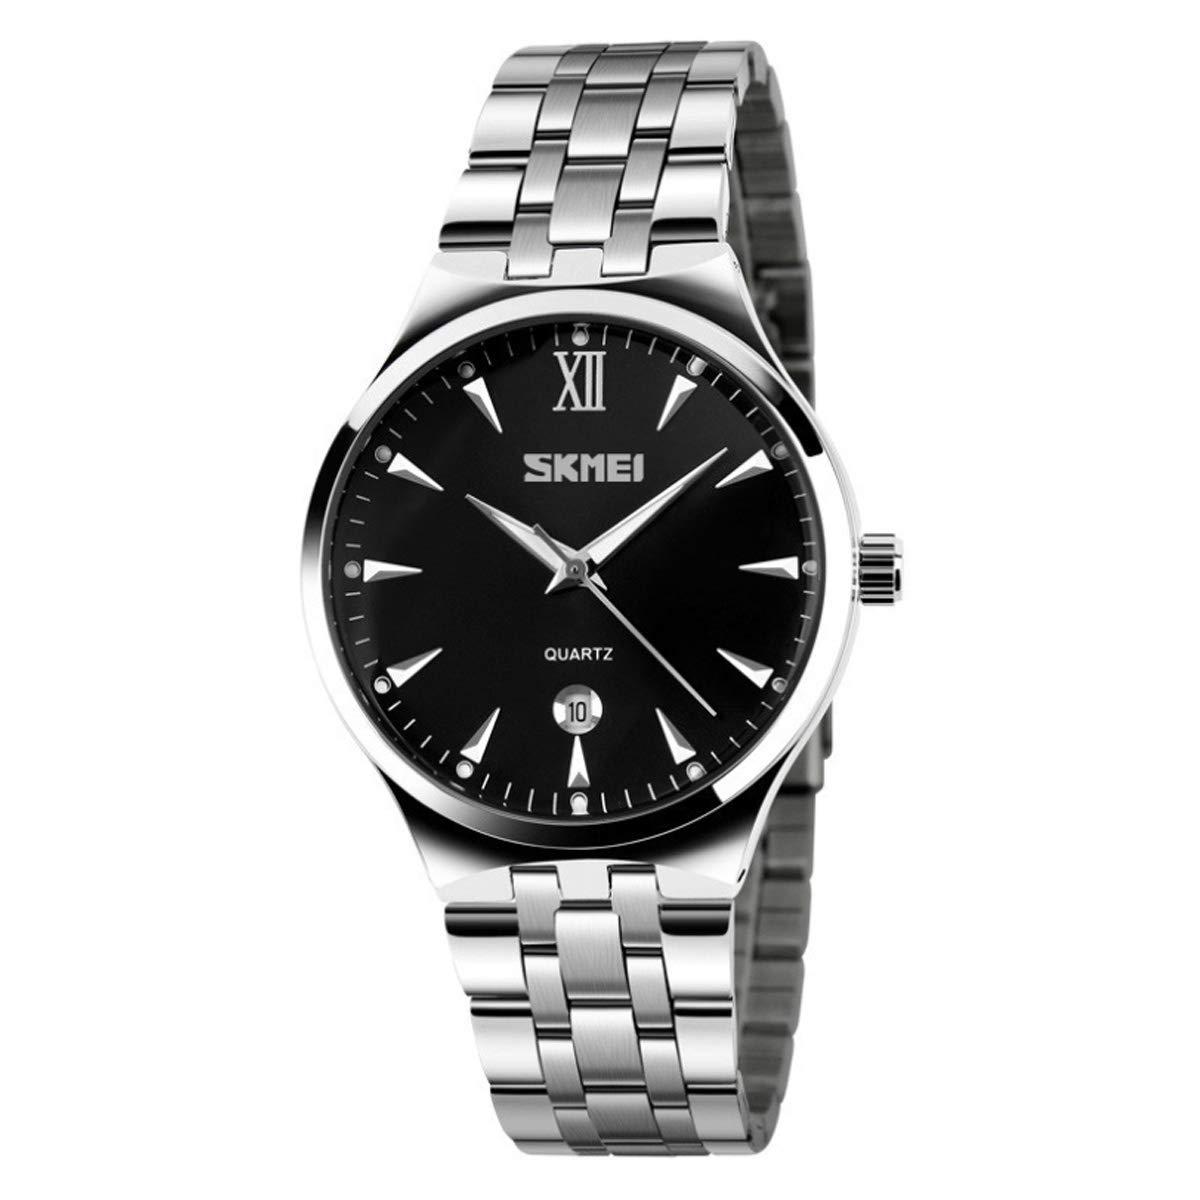 WUTONYU Women s Analog Quartz Watch Stainless Steel Luminous Business Casual Waterproof Calendar Date Window Wristwatch